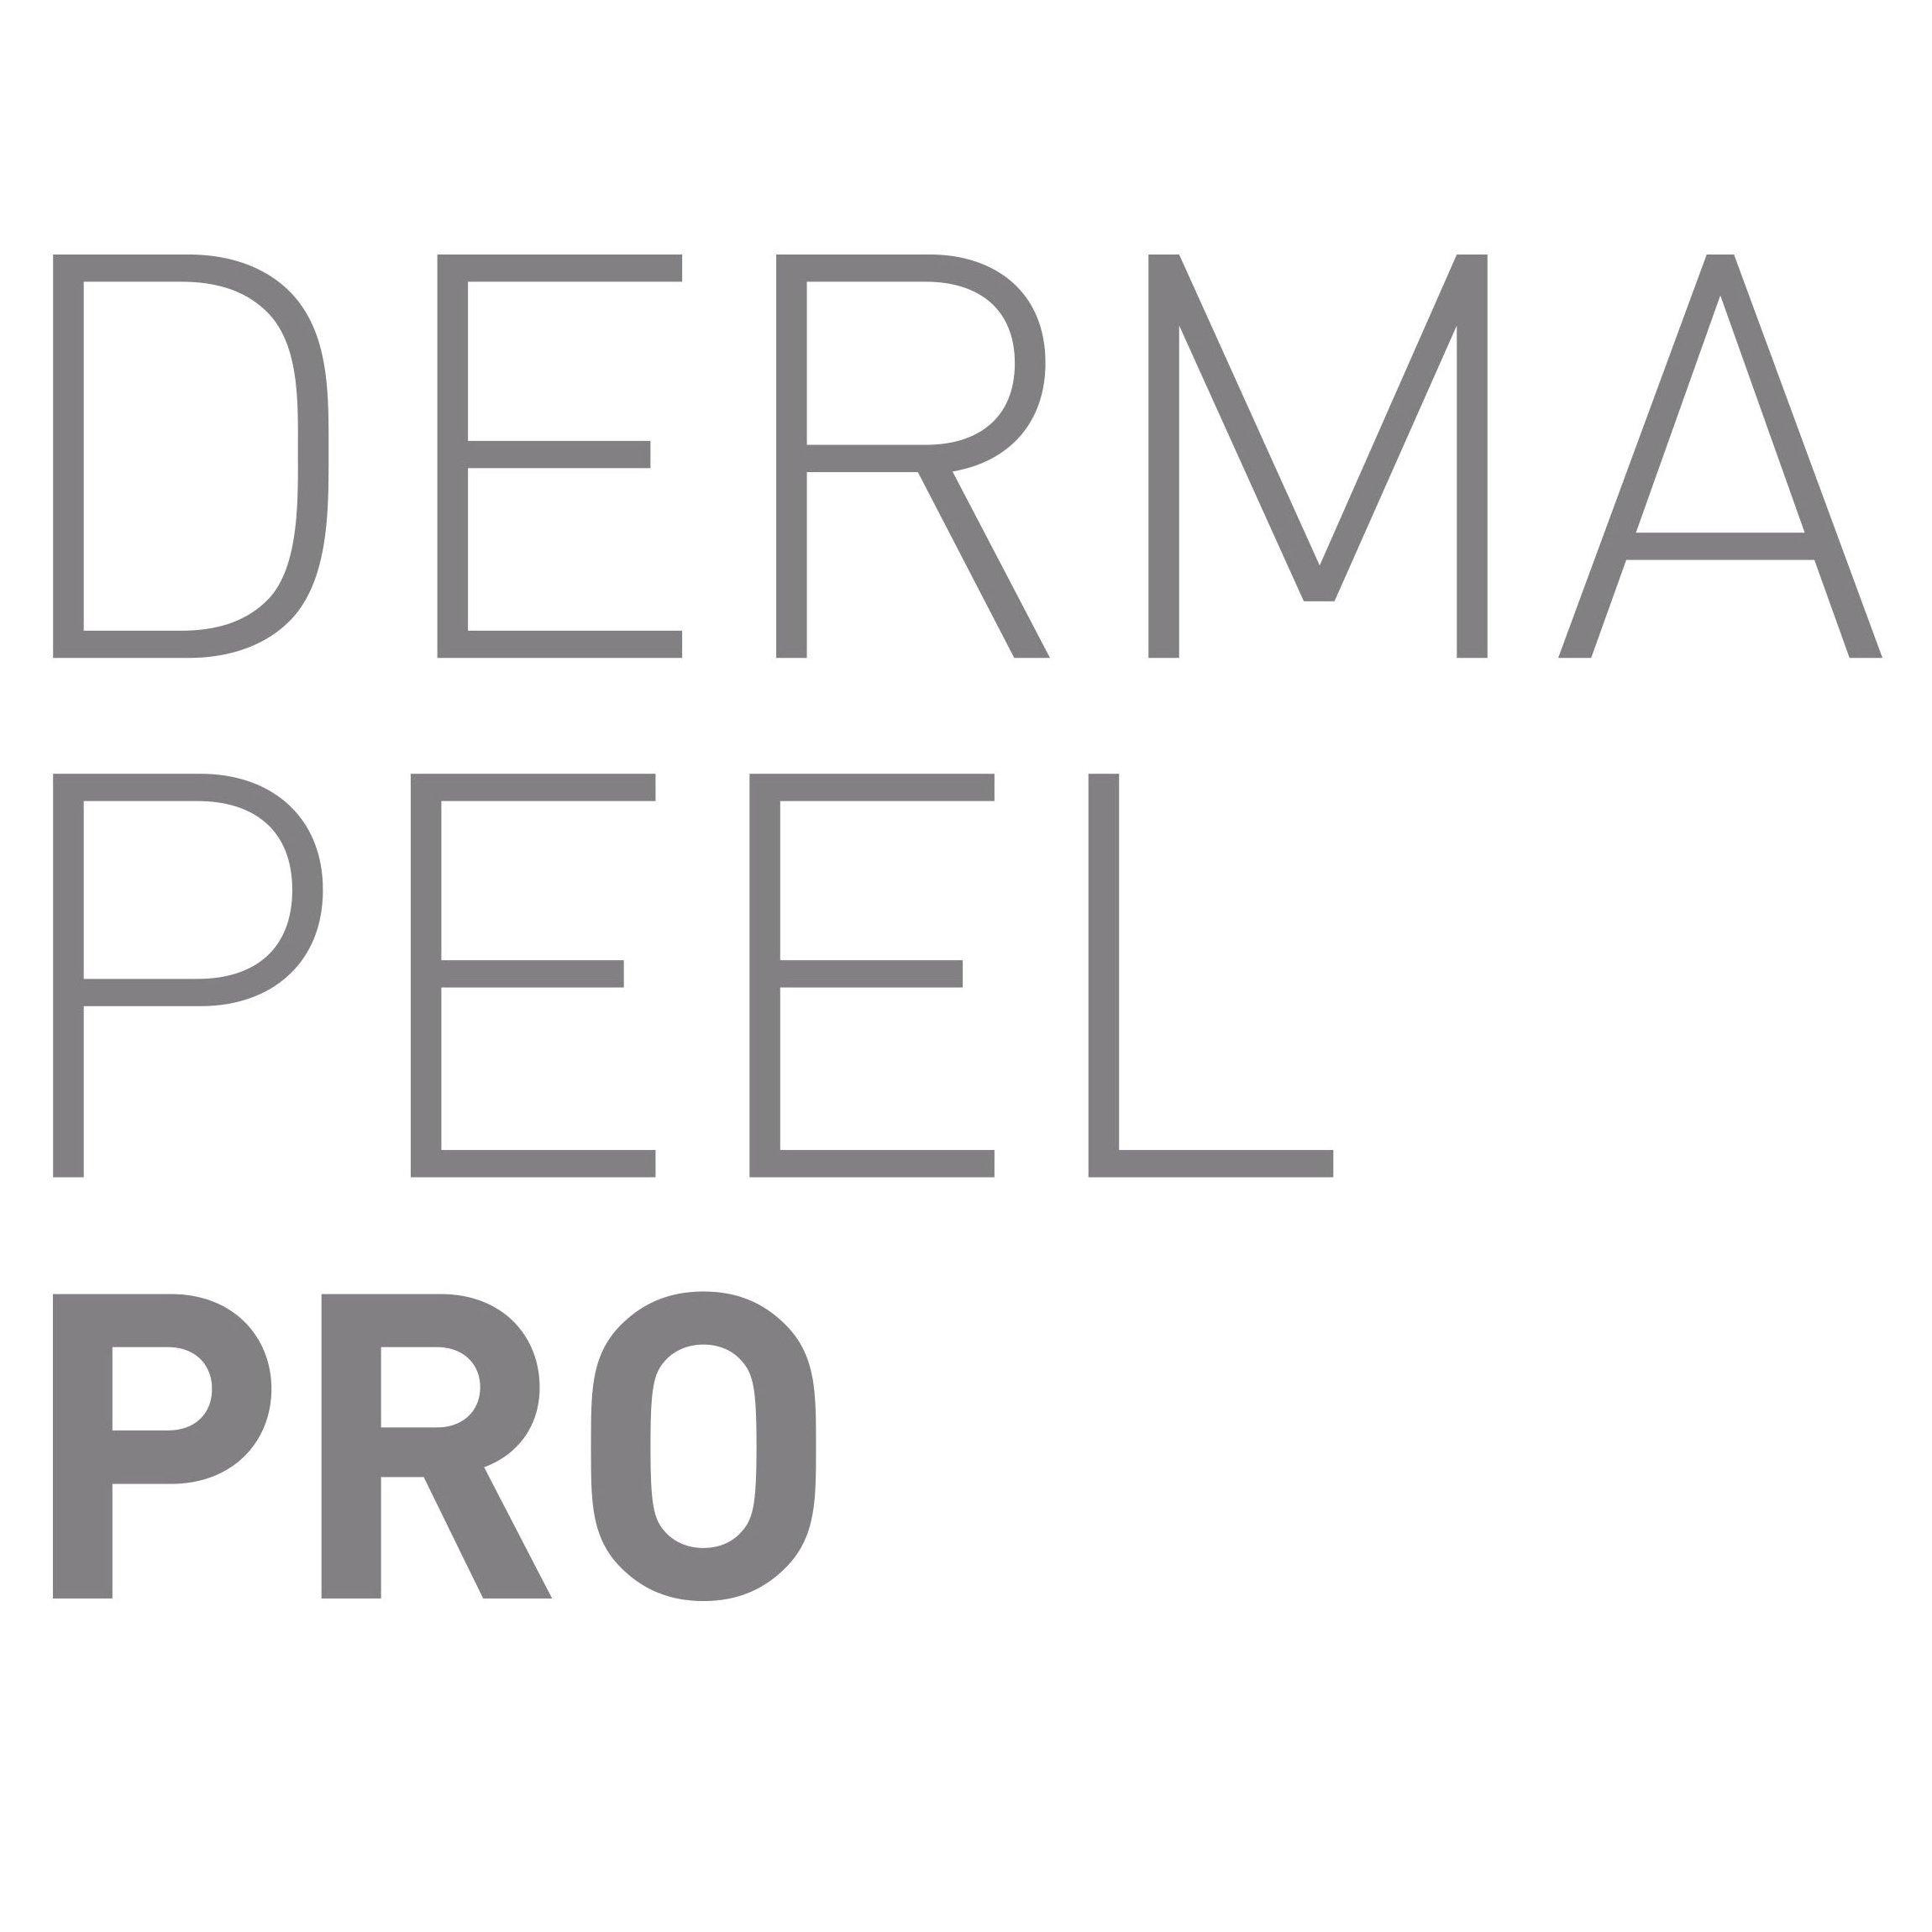 Dermapell pro: Servicios  de Beauty my